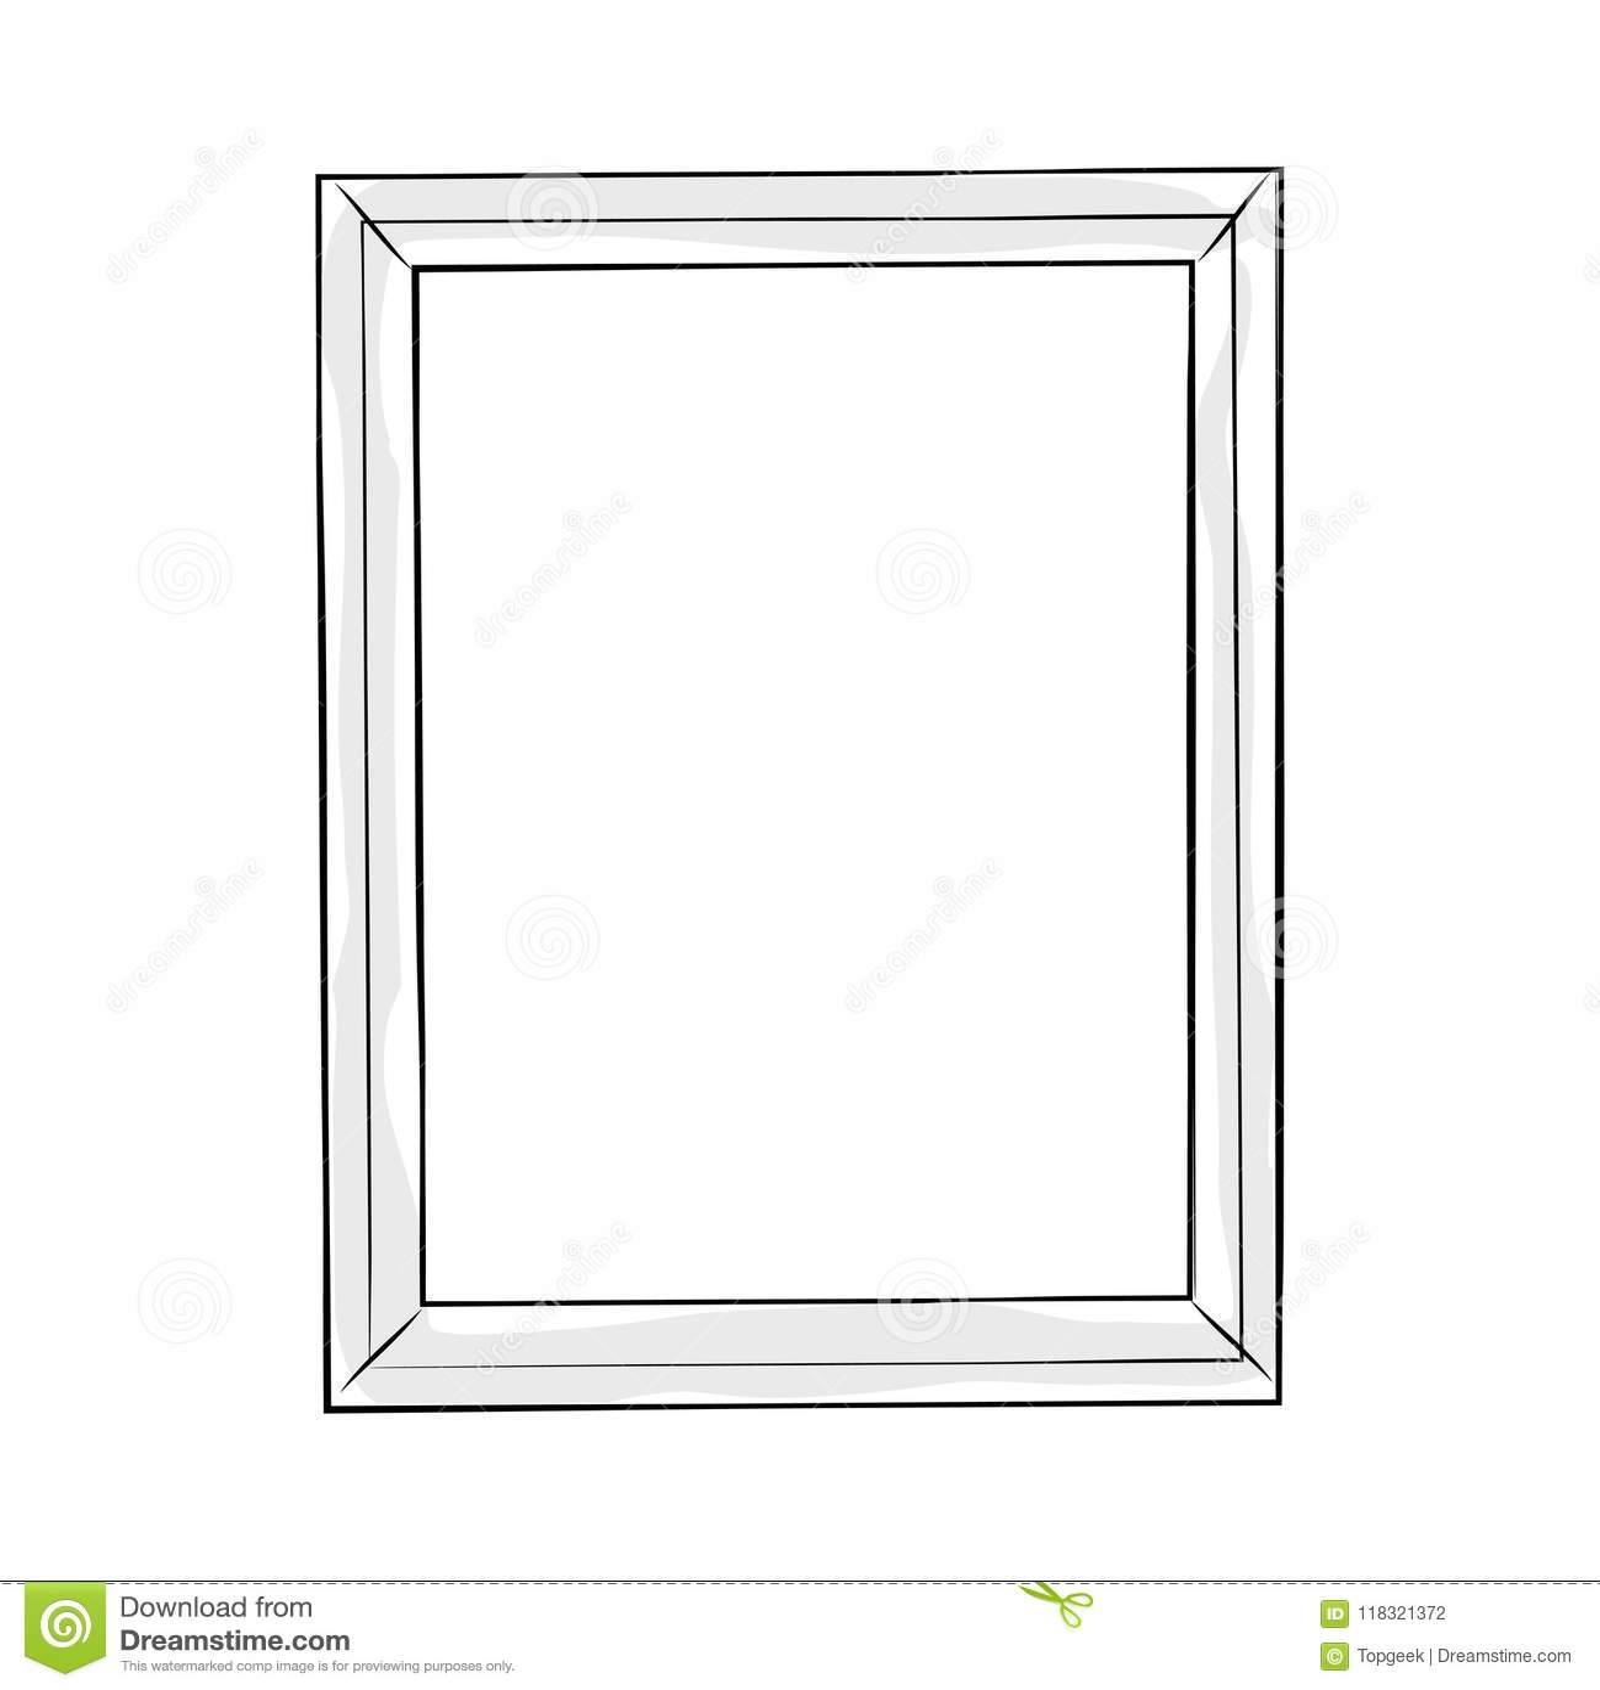 Rectangular Doodle Line Art Frame Vector Stock Vector - Illustration ...